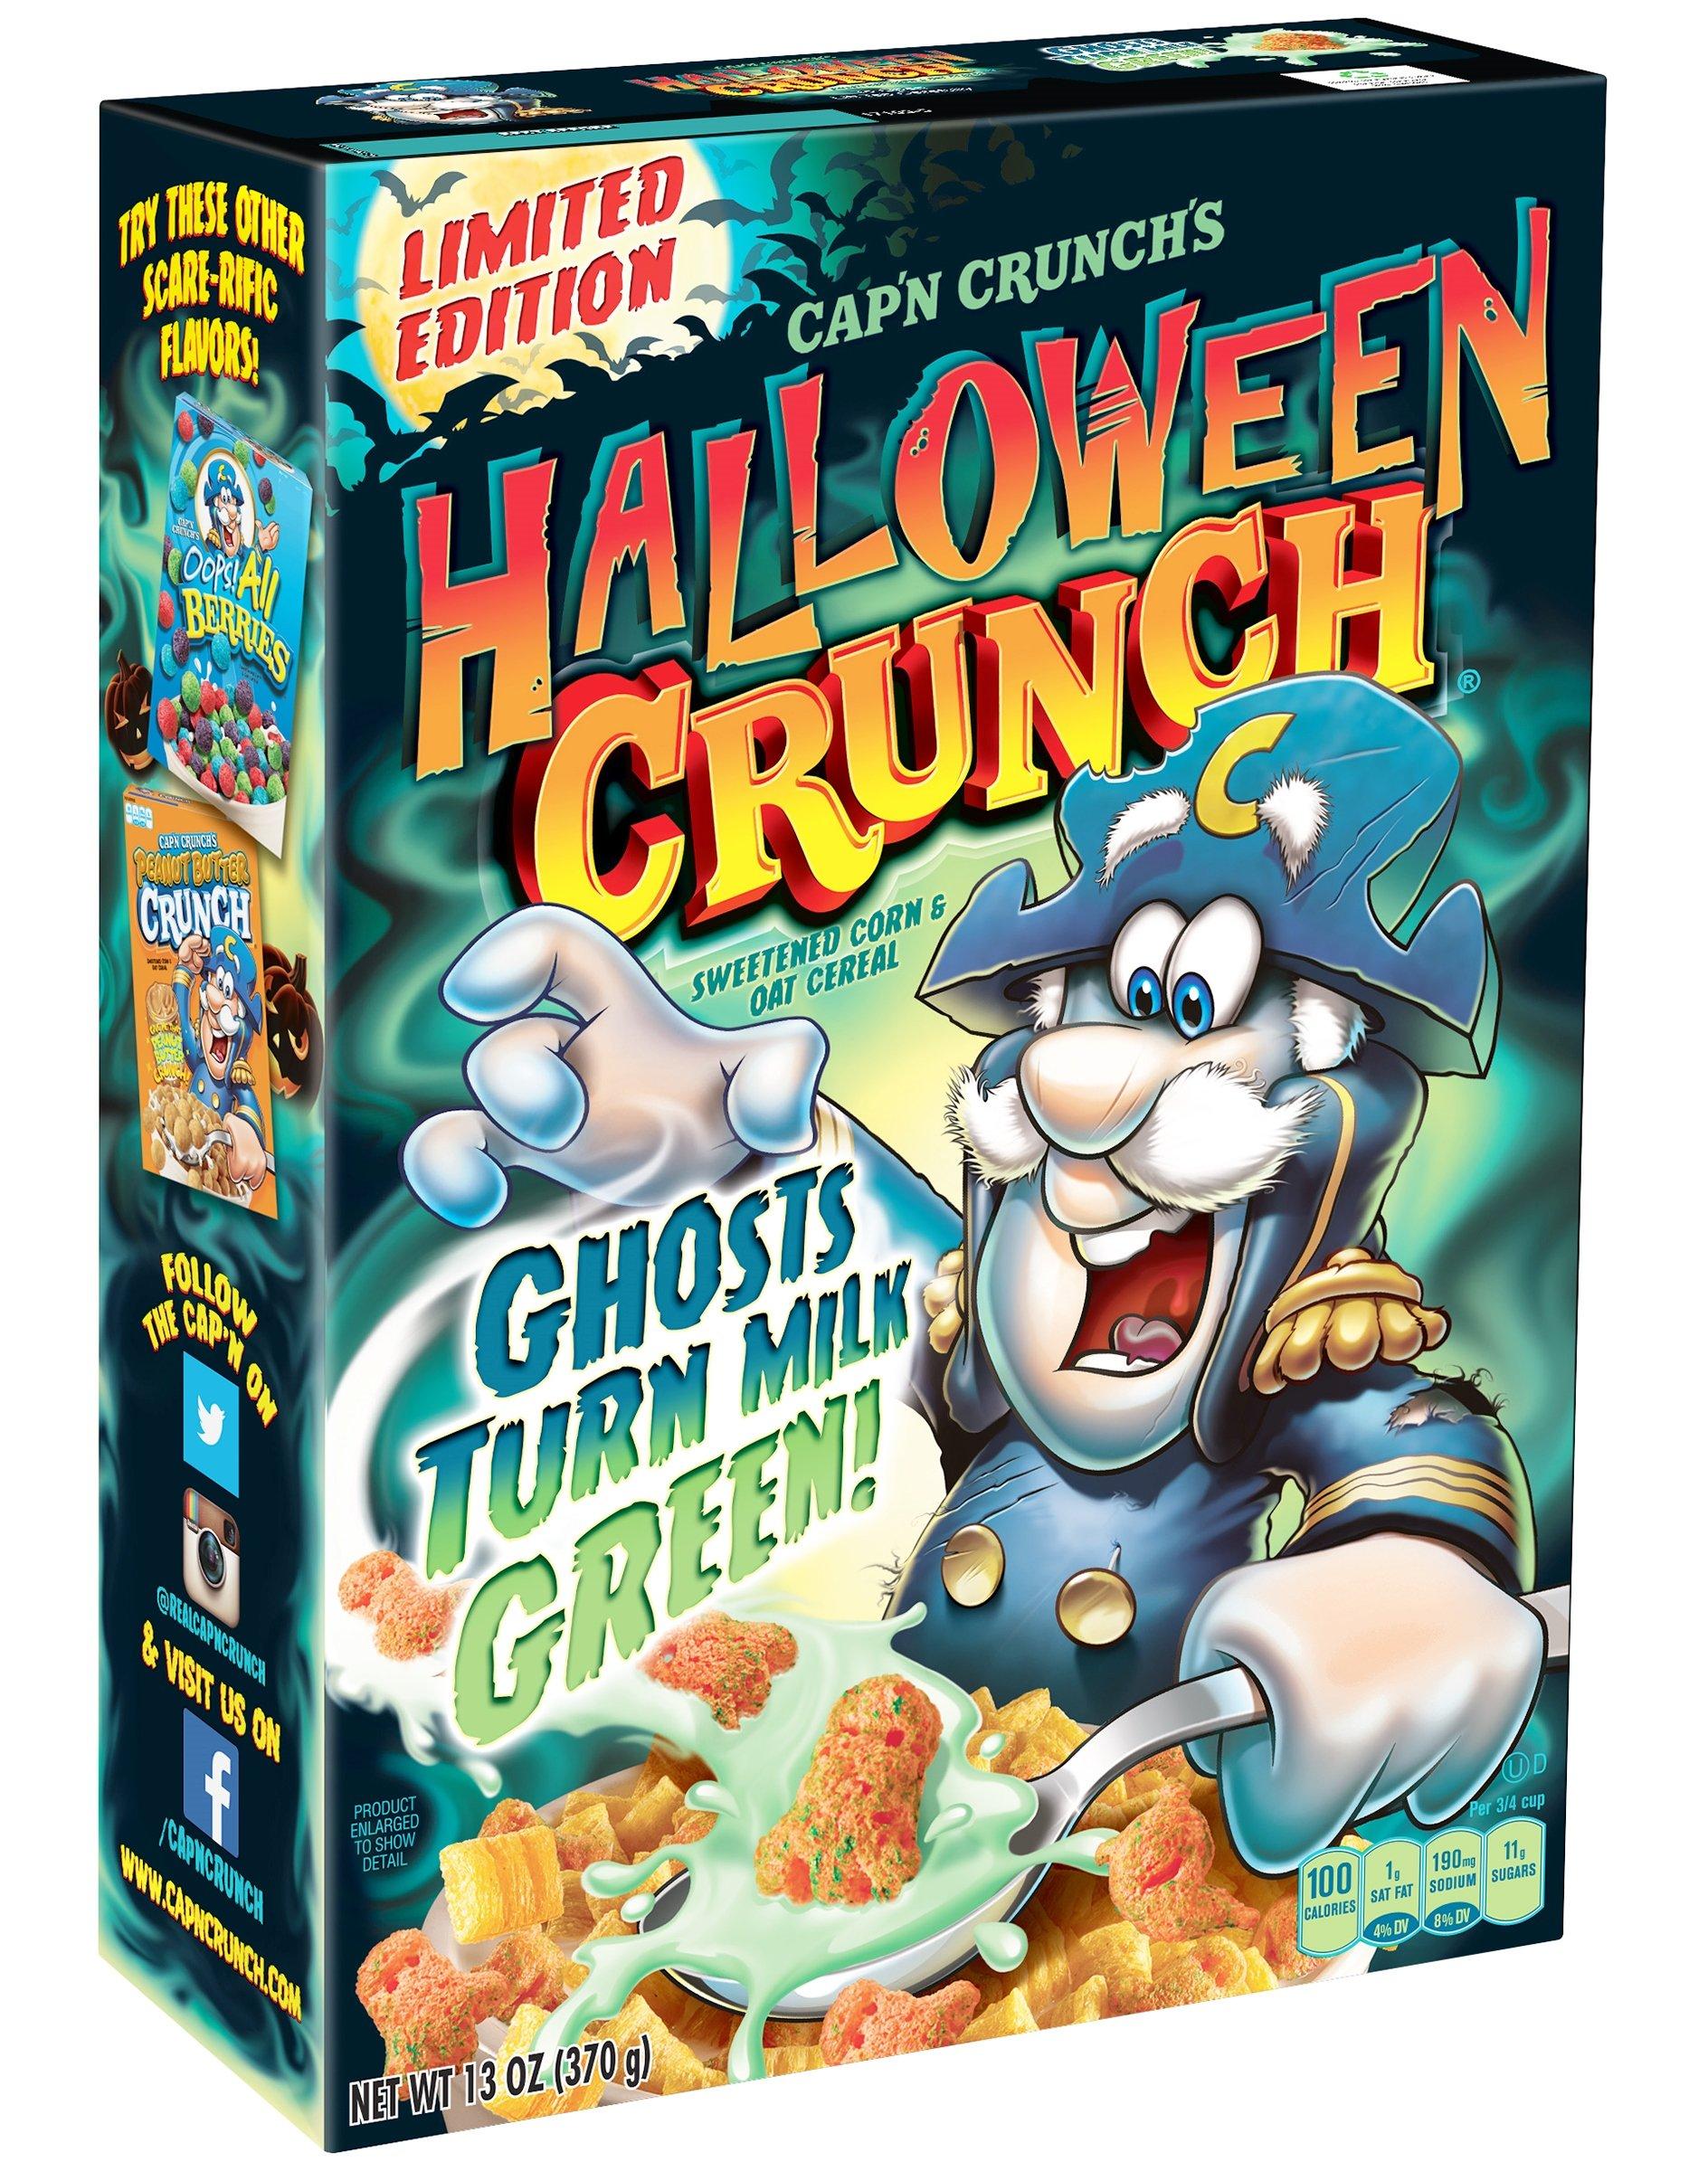 Cap'n Crunch Halloween Crunch Cereal - Your Milk Turns Green 13 oz. (Pack of 2)